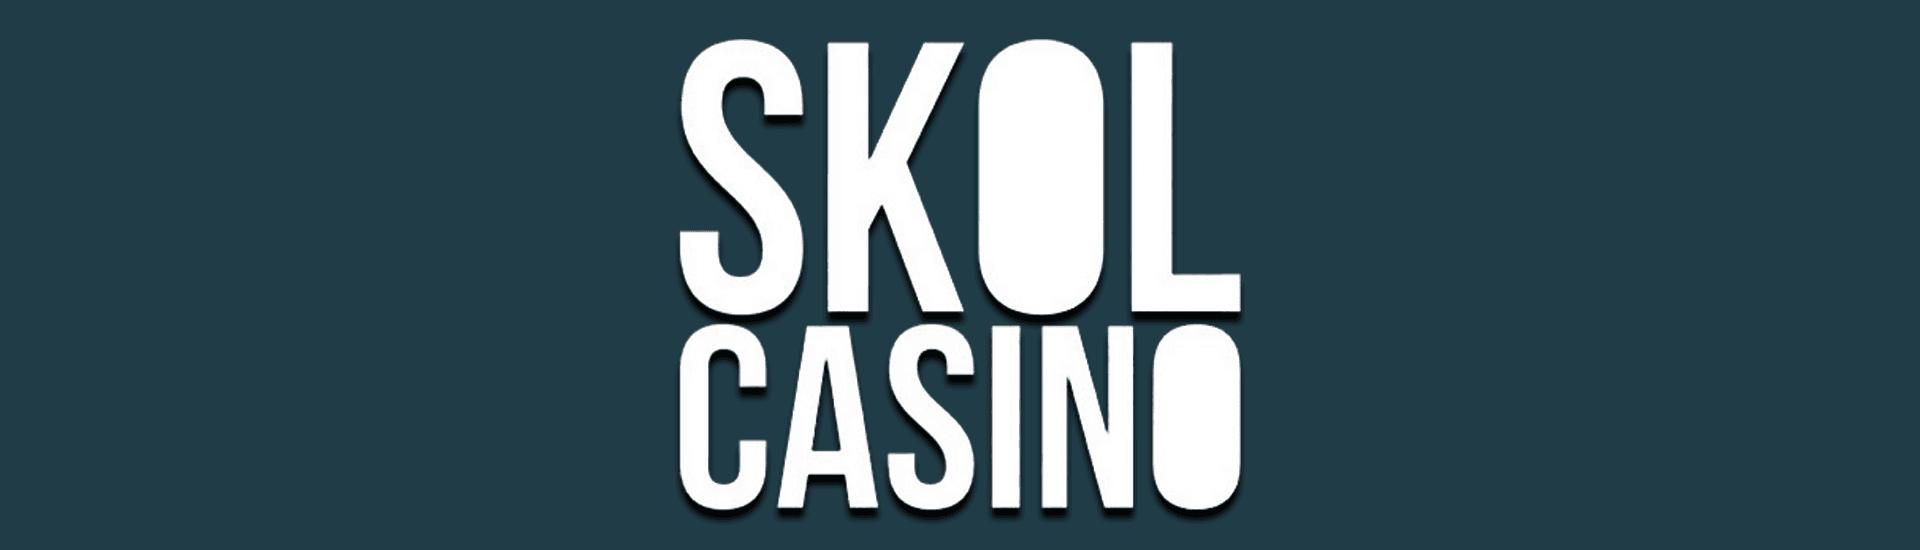 Skol Casino Featured Image